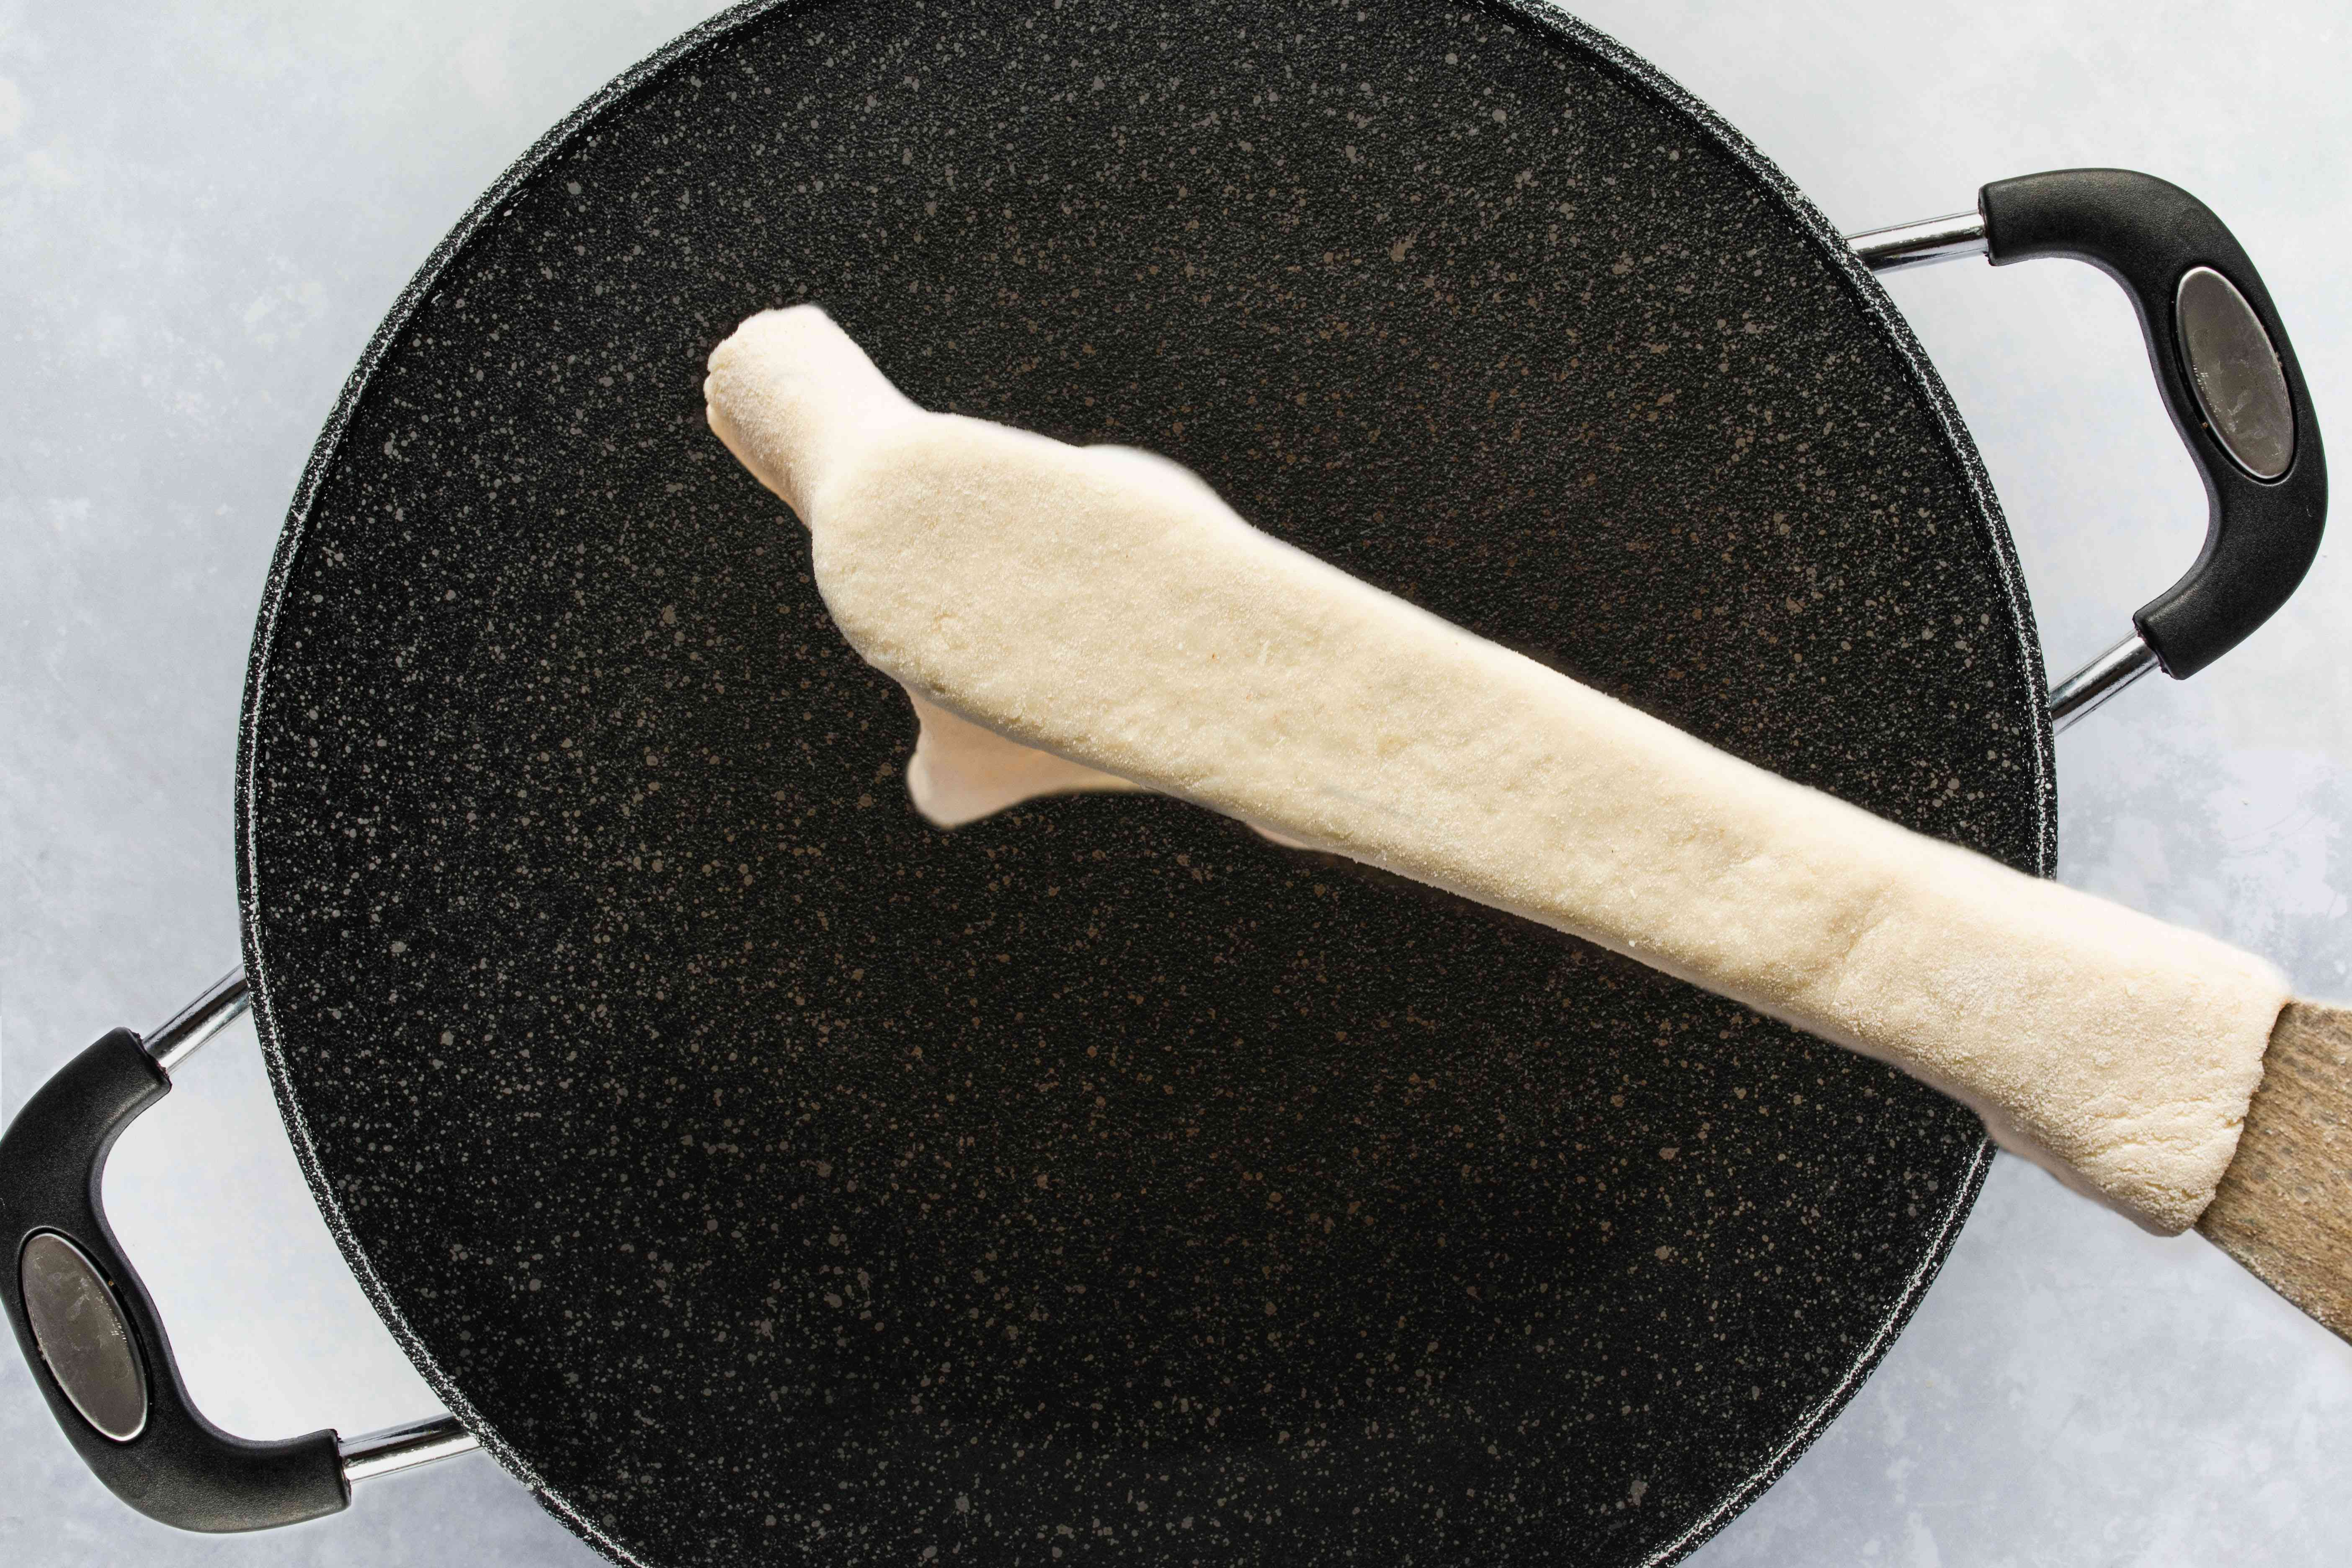 Transfer dough onto the griddle